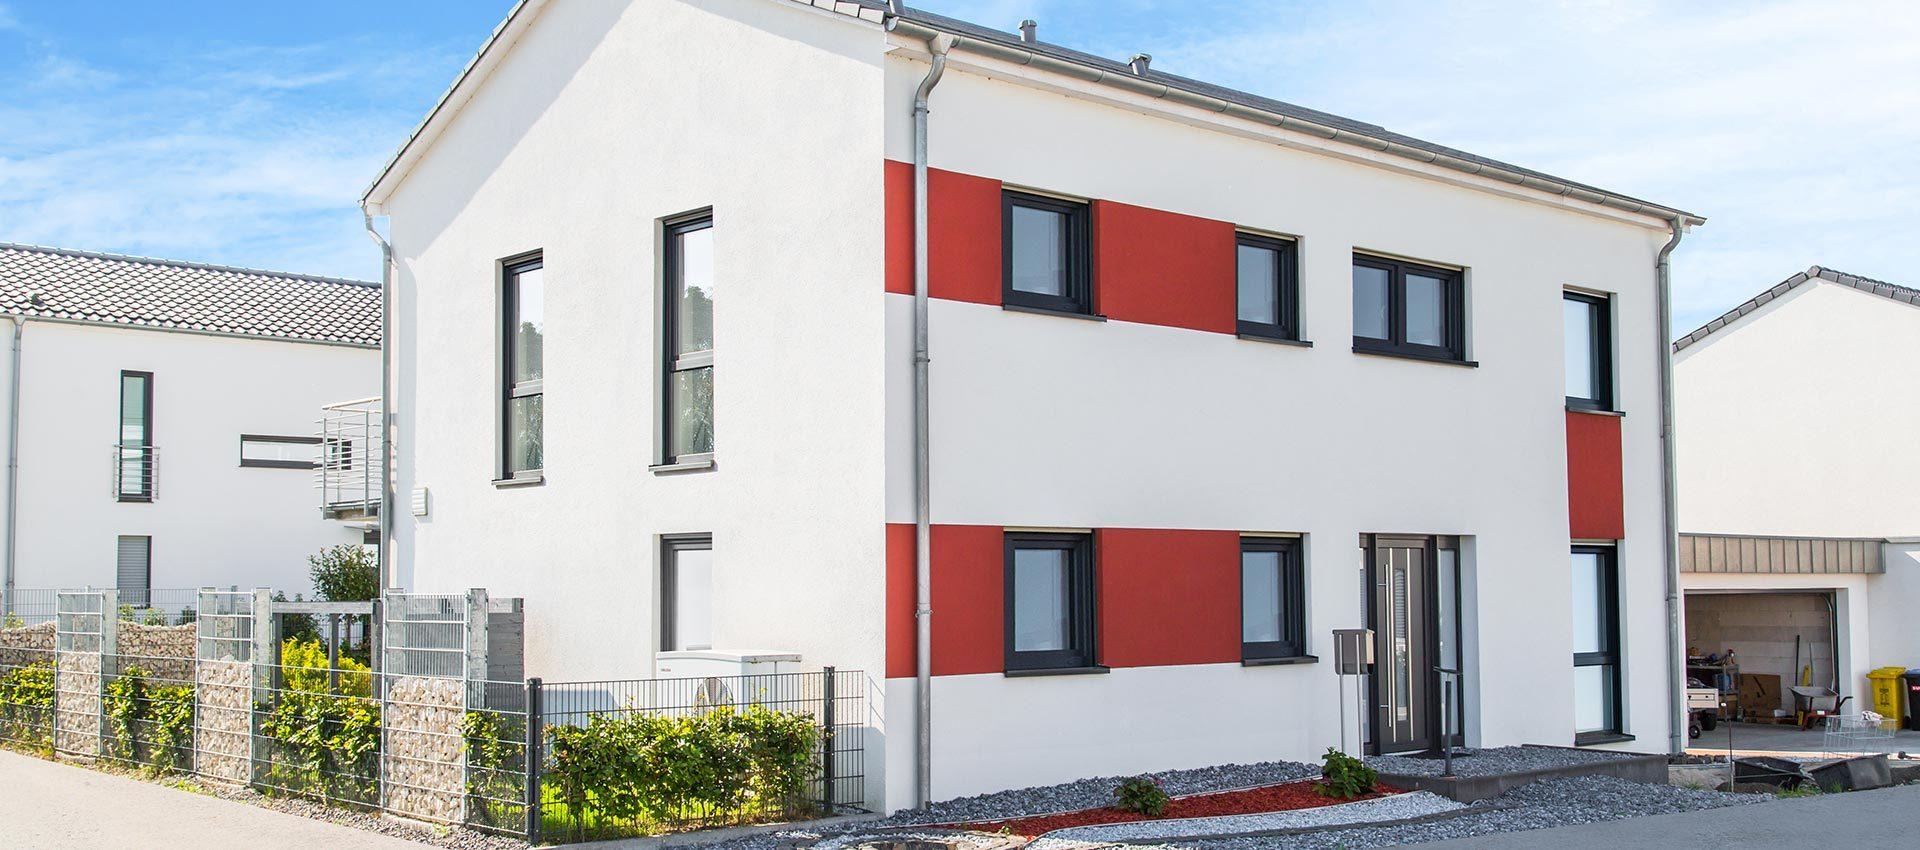 Haus Taschner PN1877